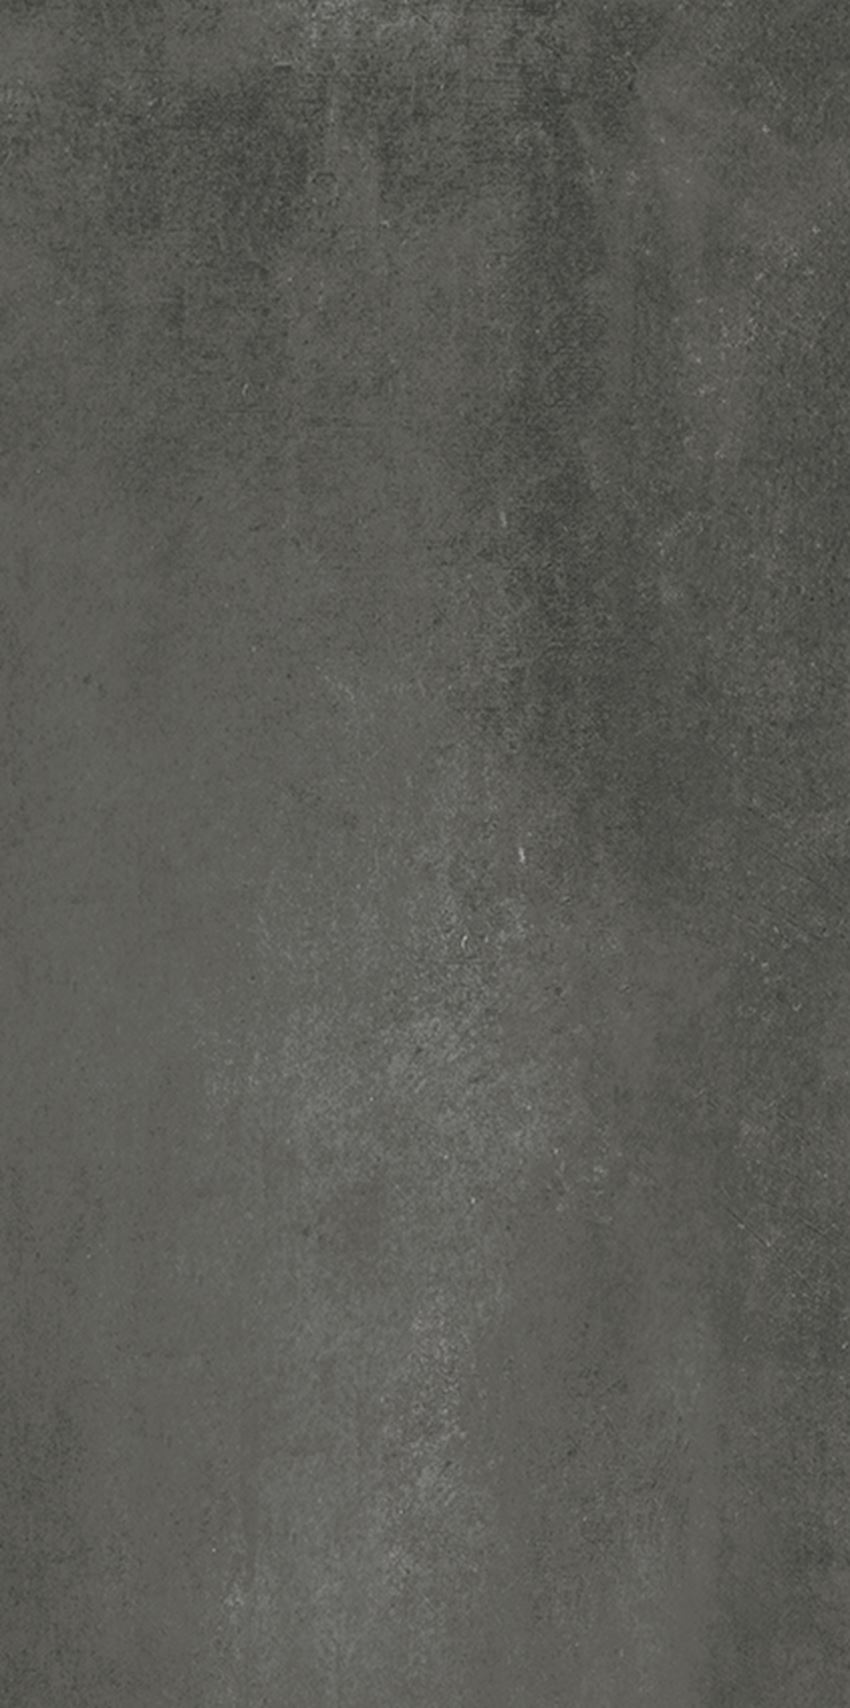 Płytka uniwersalna 29,8x59,8 cm Opoczno Grava Graphite